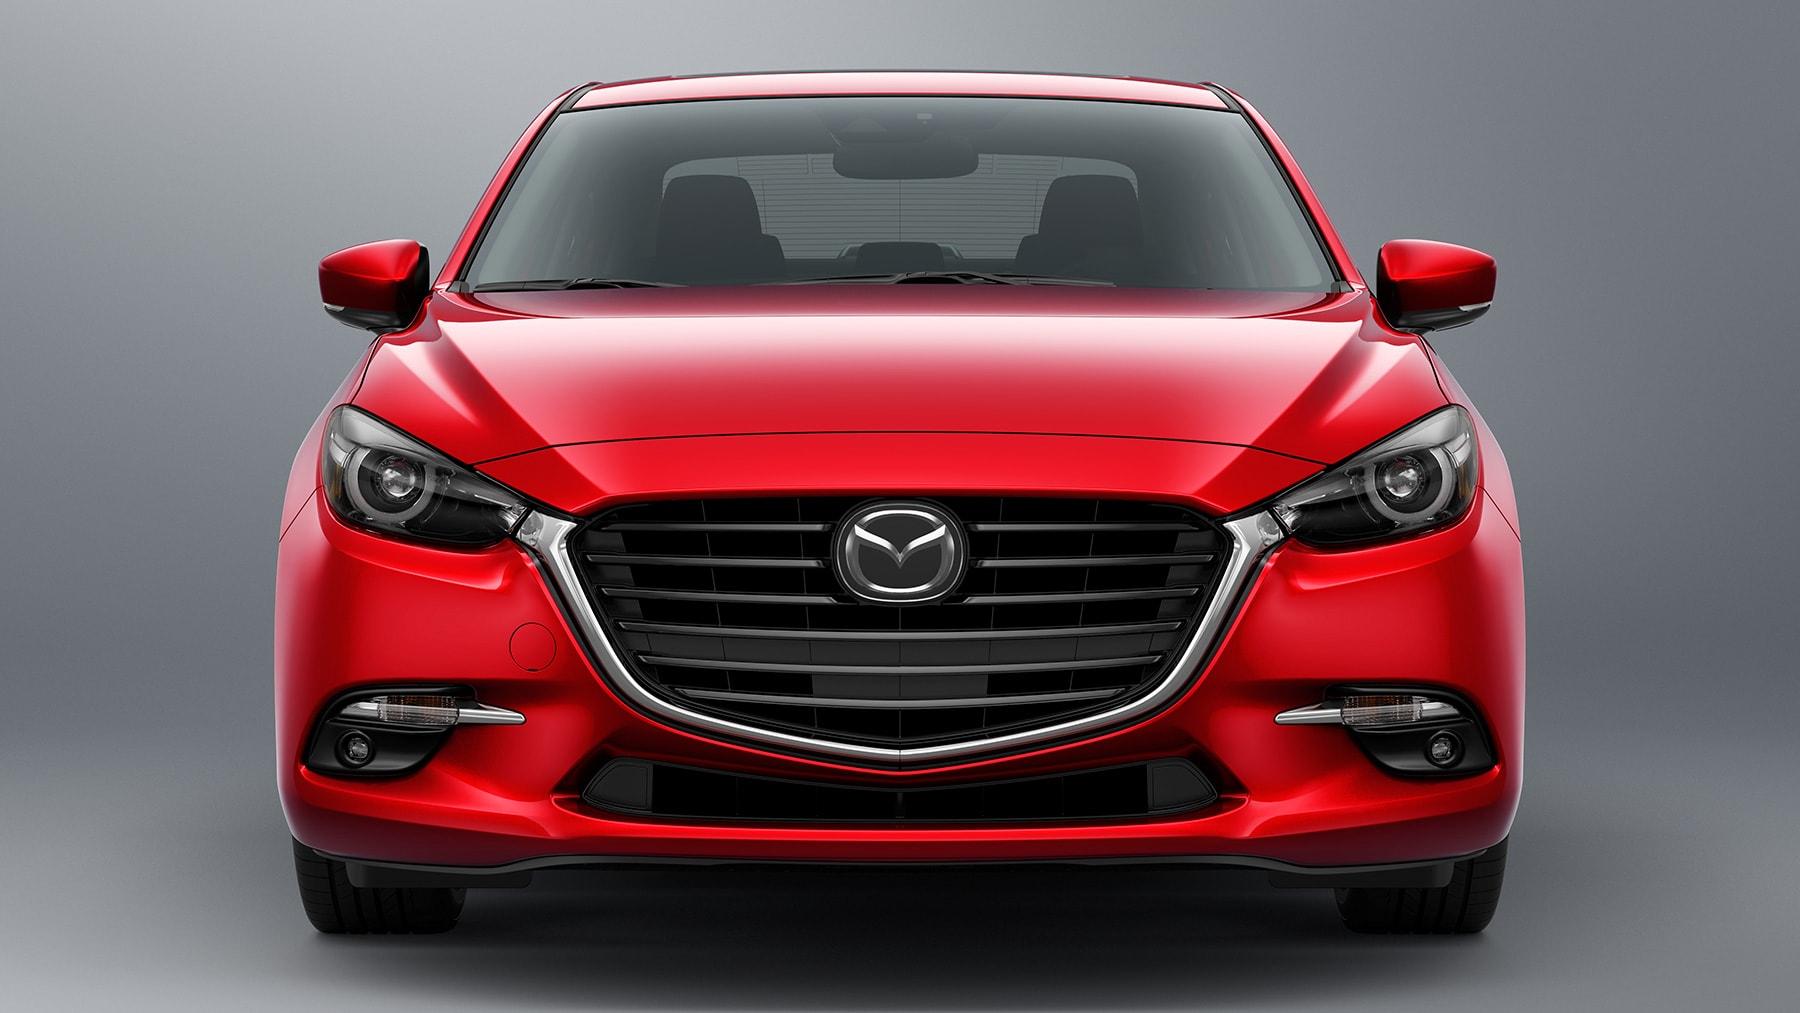 Mazda 3 Owners Manual: Overhead Lights